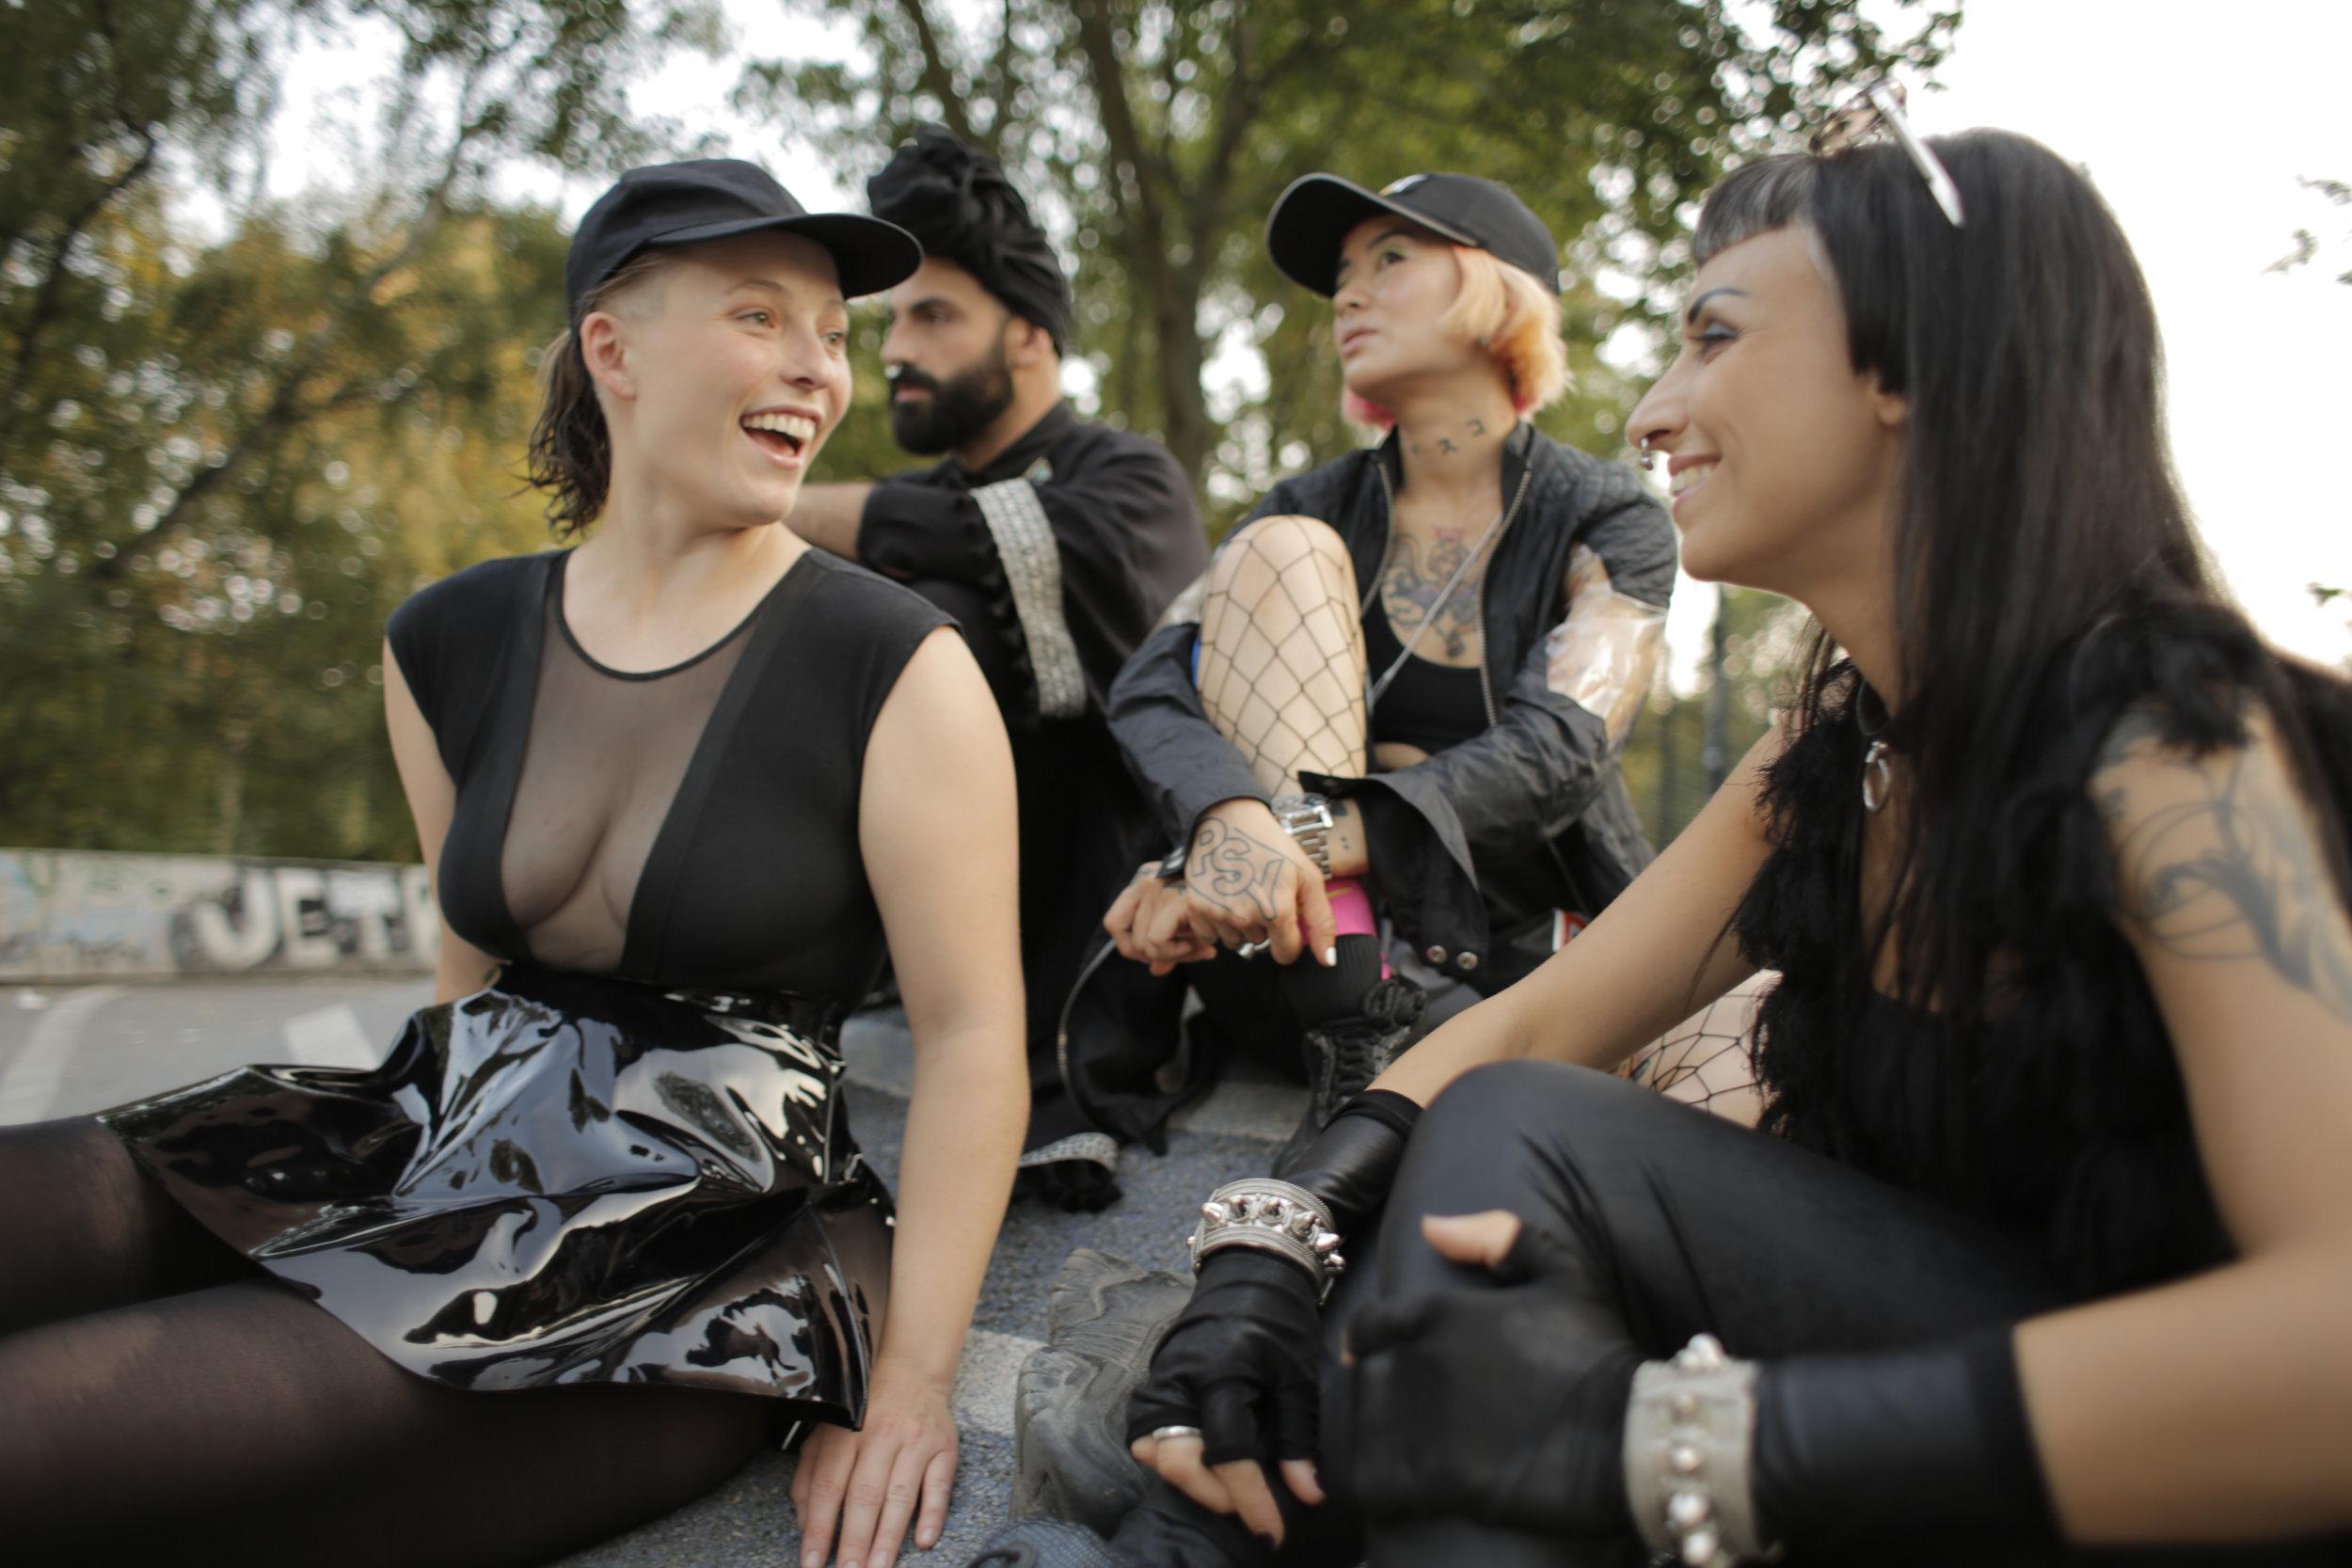 Models(left to right): Ramona, Gian Luigi, Cat,Nadja Buhagiar Photography Joerg Brunsendorf Styling: Teodora Jimborean Hair & Make-up: Gianluca Venerdini